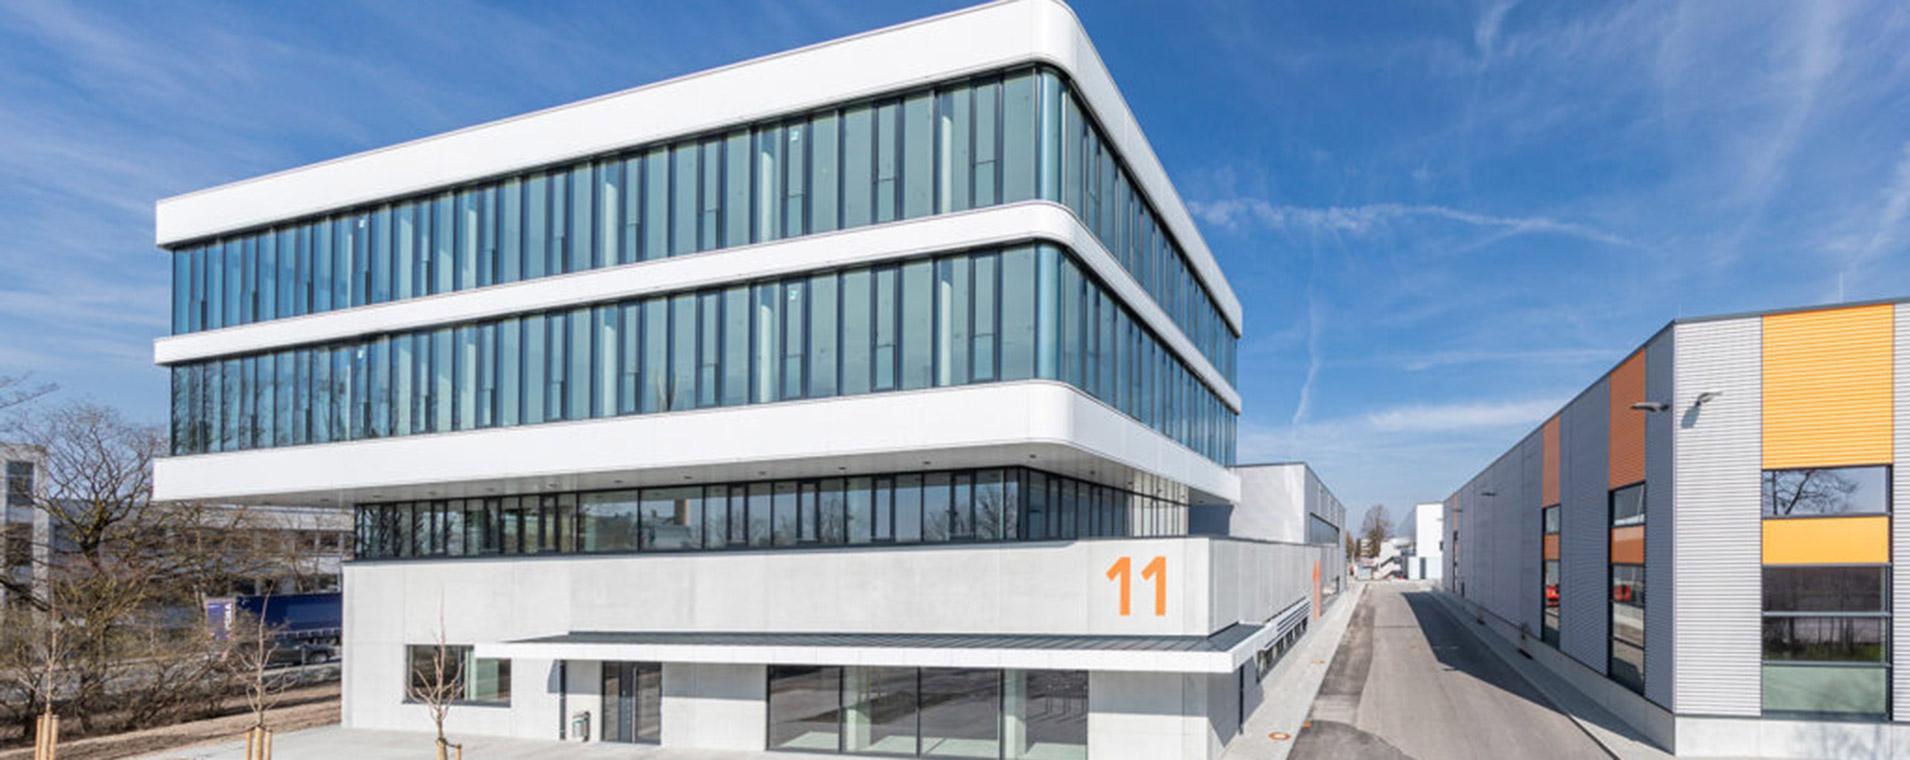 Büro Architektur Nova Neufahrn